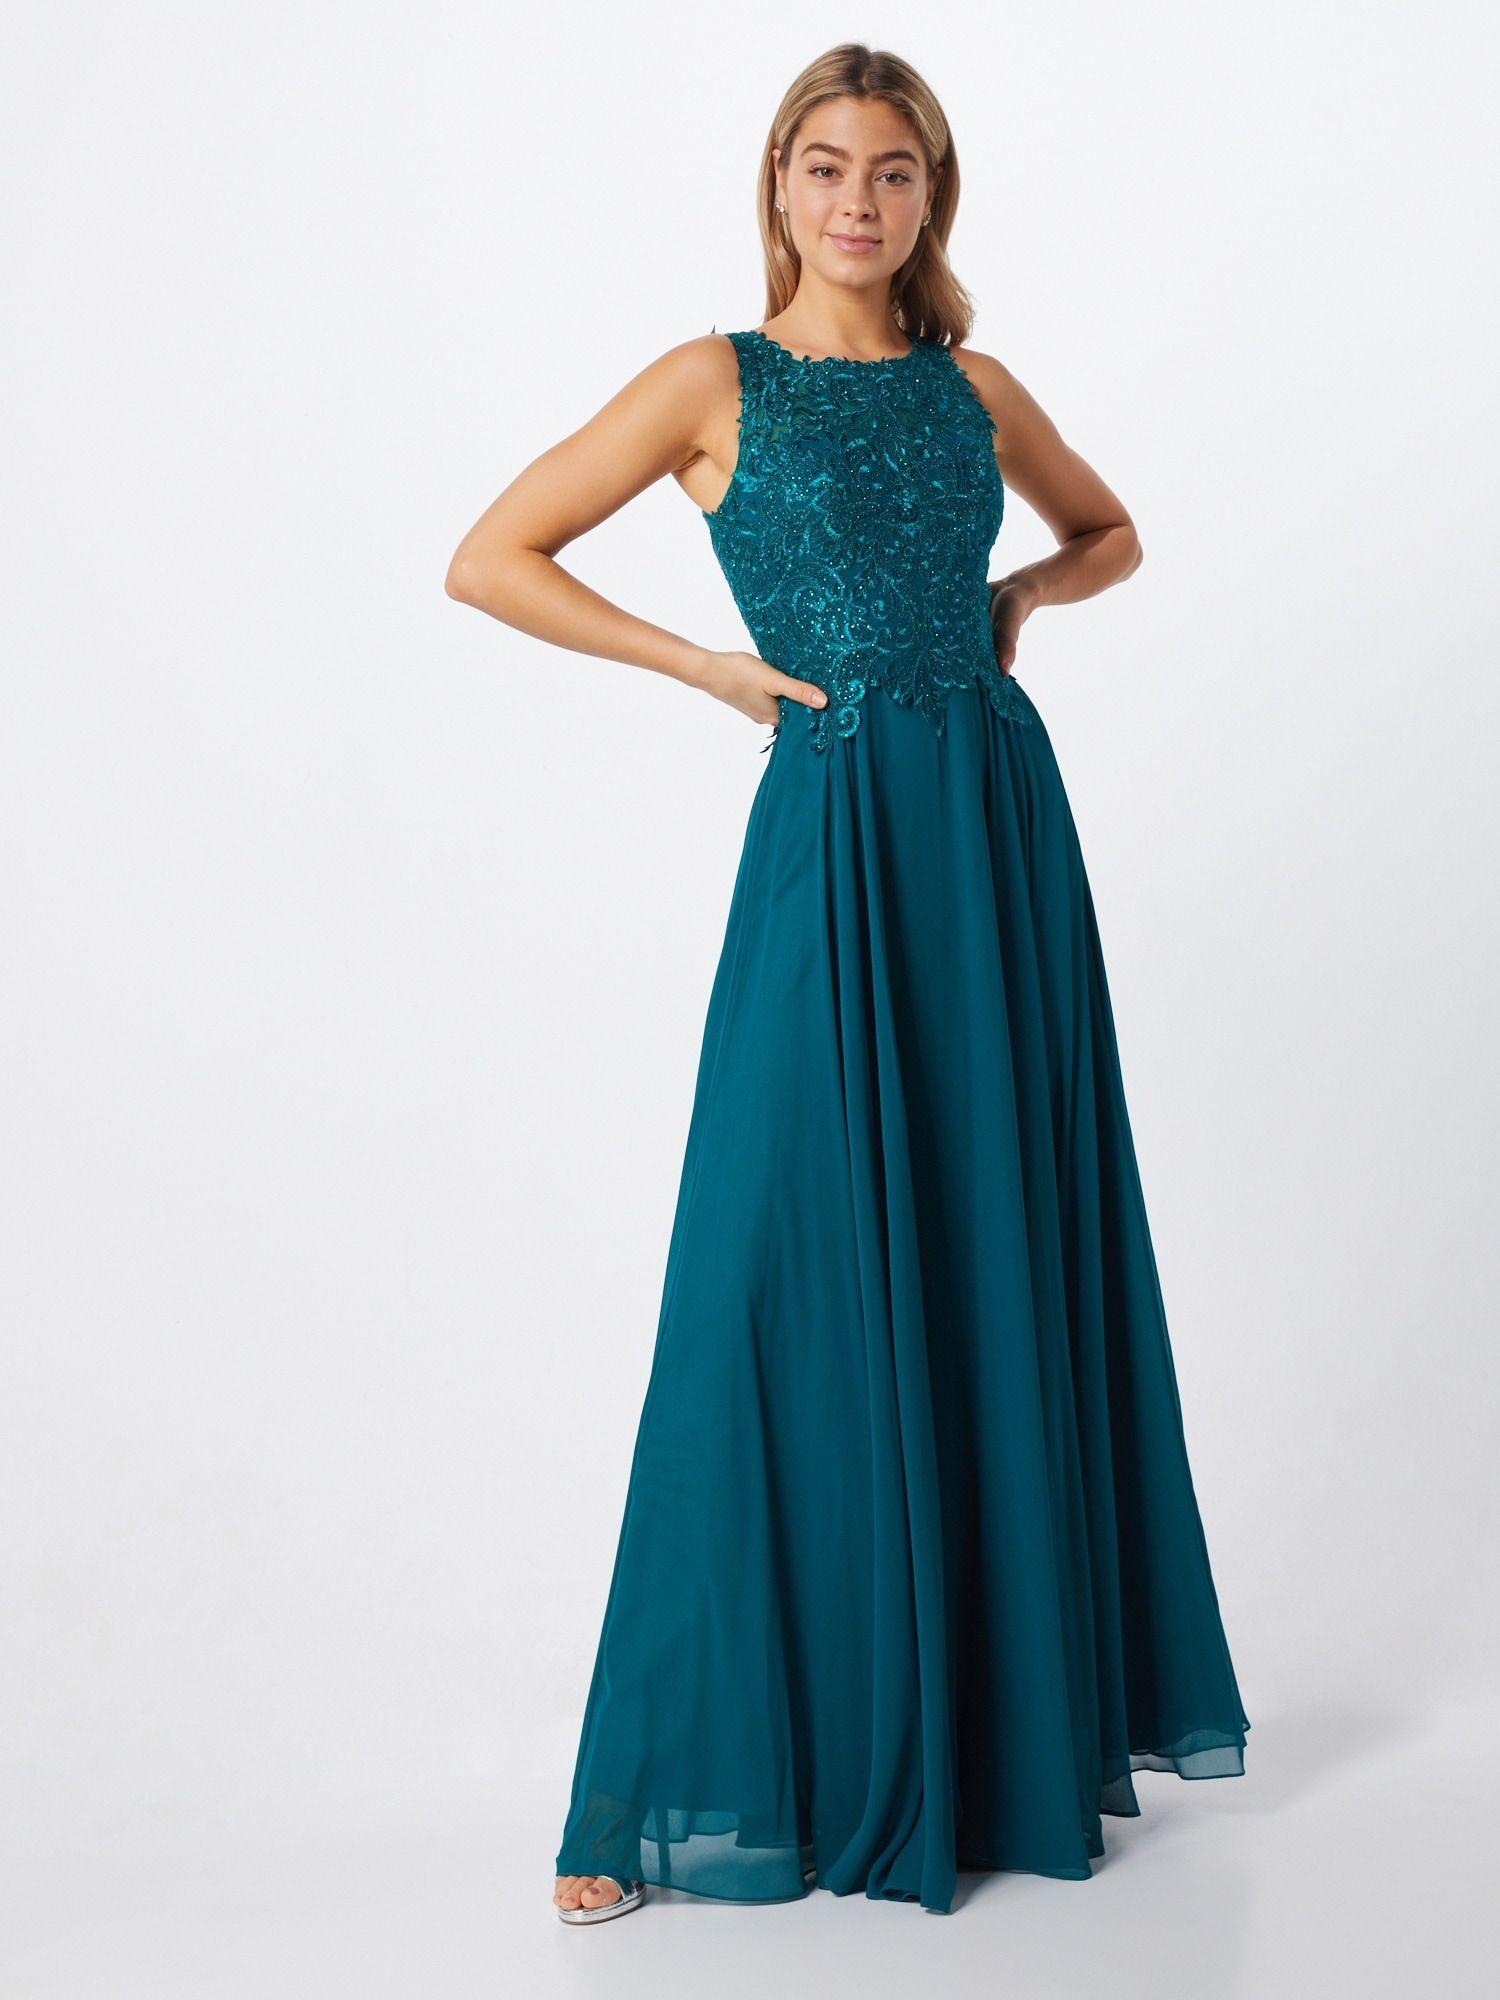 LUXUAR Kleid in smaragd - #Kleid #LUXUAR #smaragd in 15  Luxuar